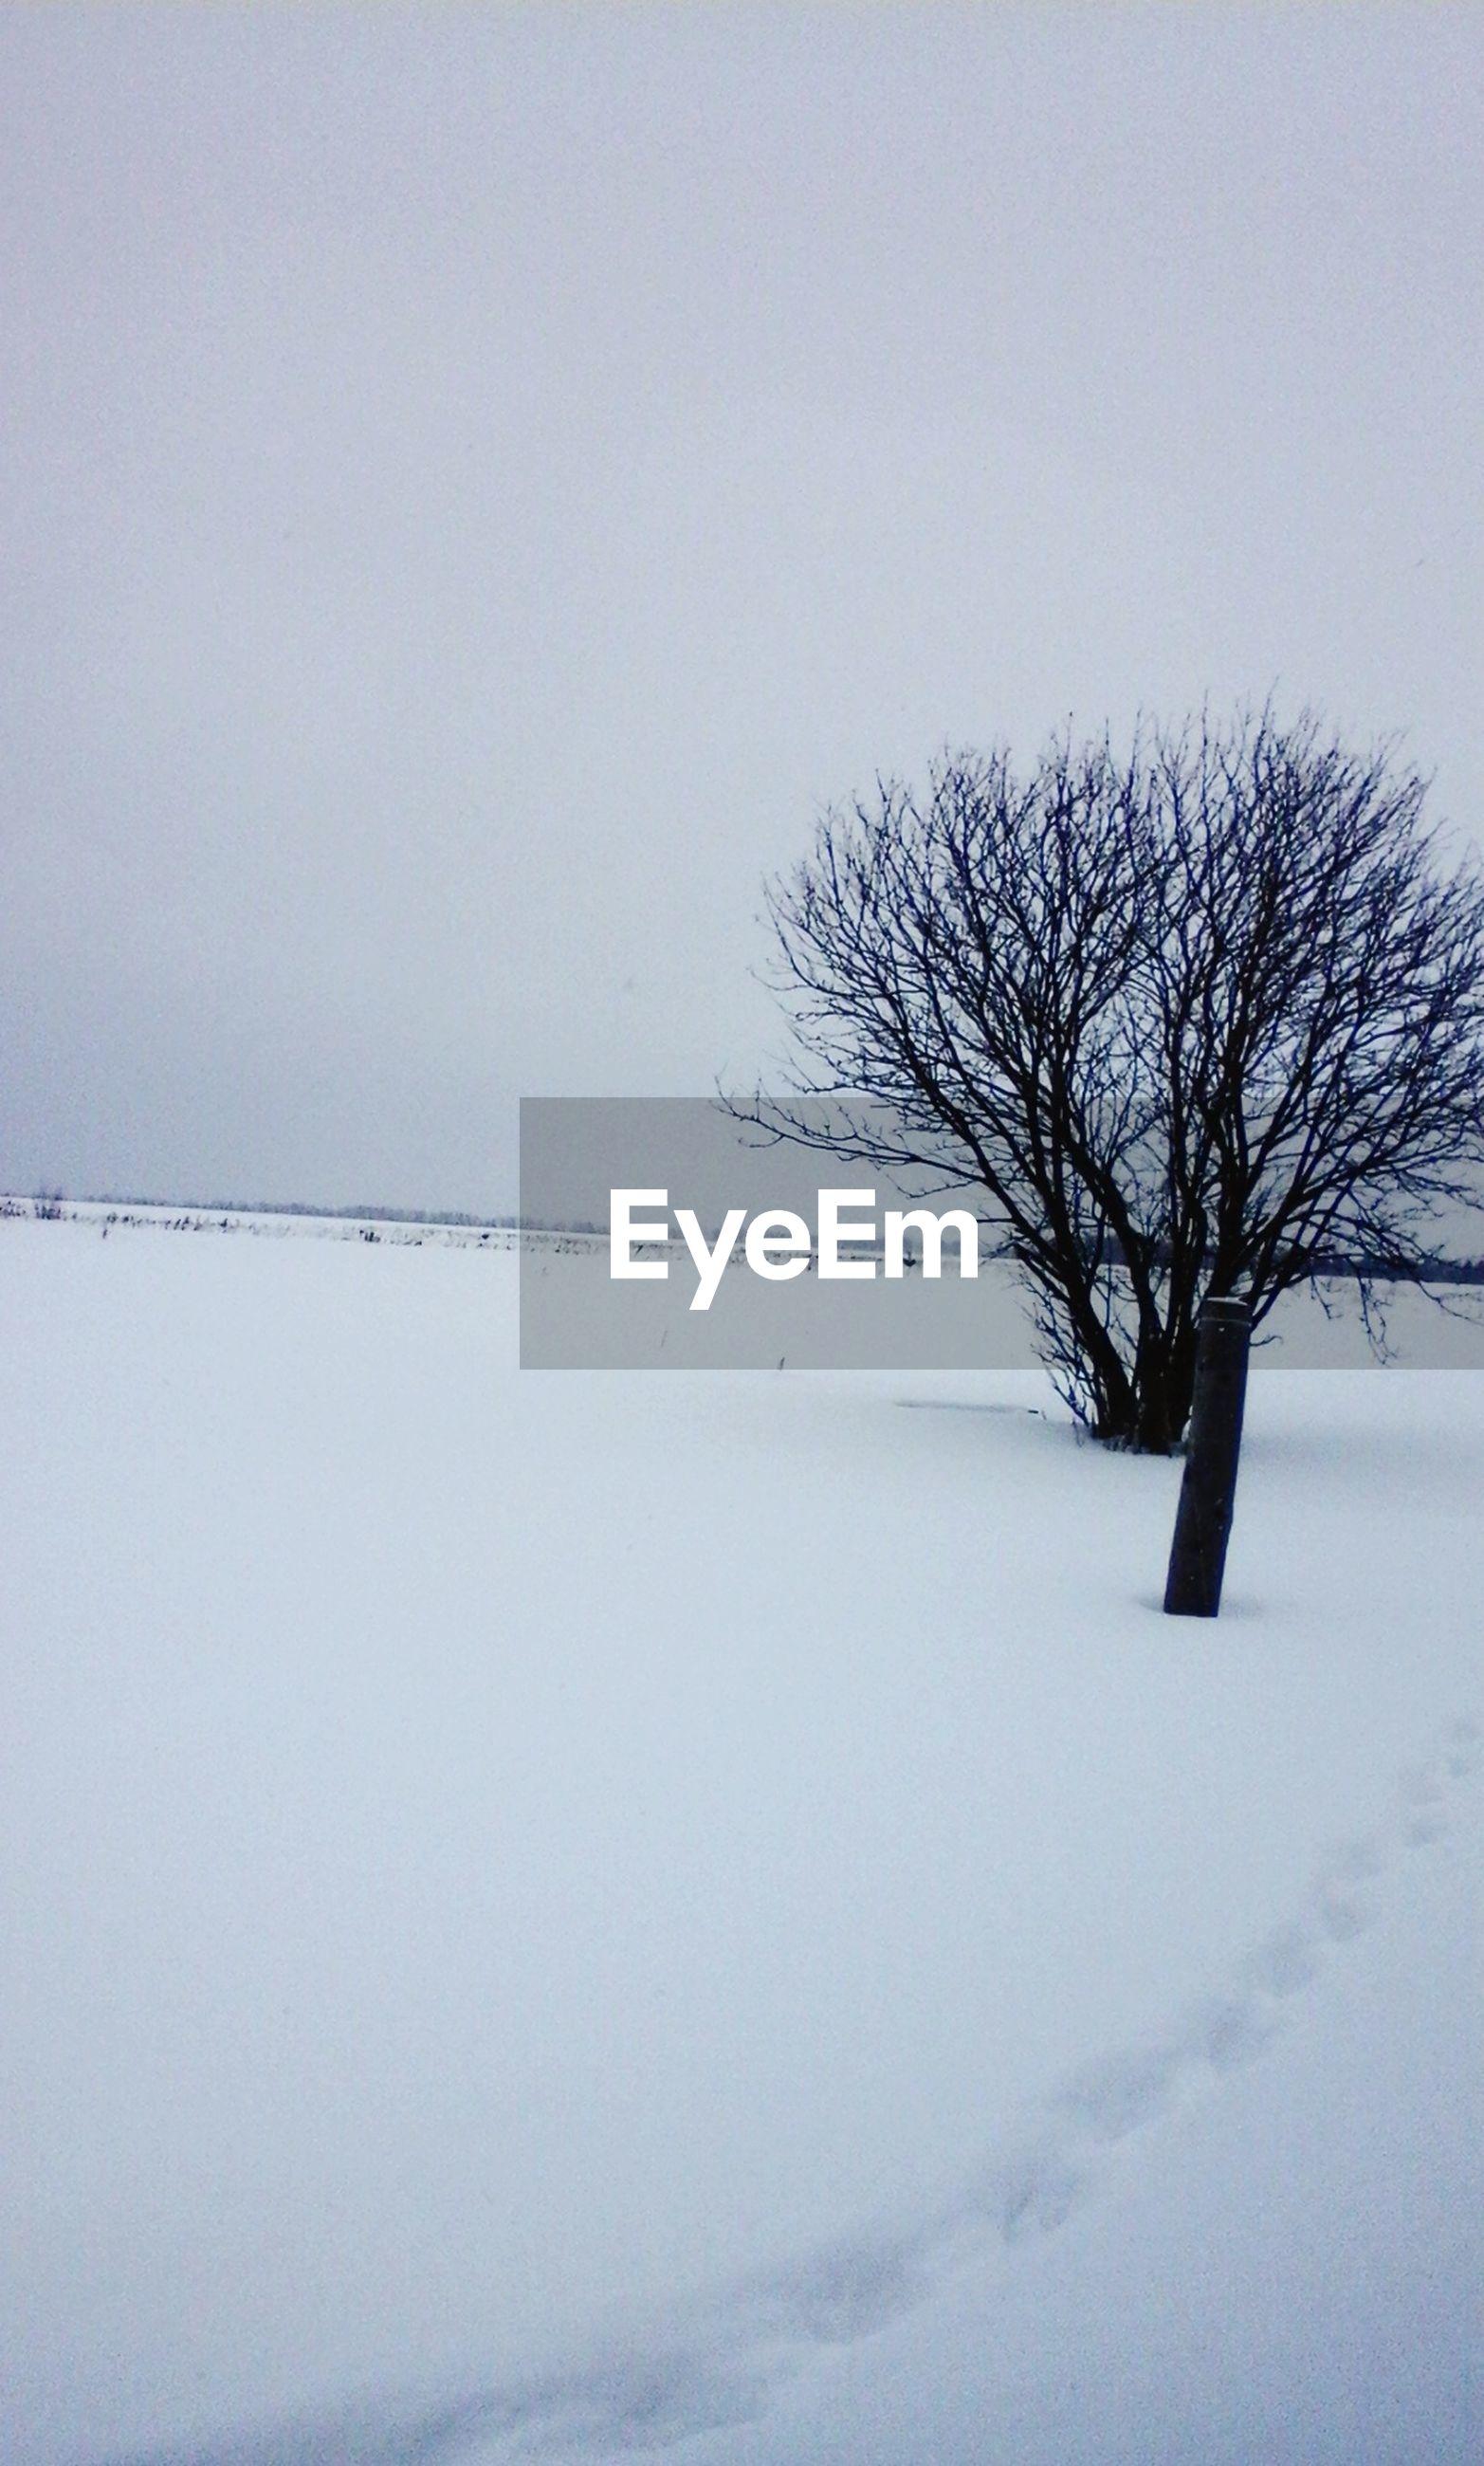 winter, bare tree, snow, cold temperature, tranquility, tranquil scene, tree, clear sky, weather, scenics, landscape, beauty in nature, nature, season, copy space, branch, covering, sky, non-urban scene, field